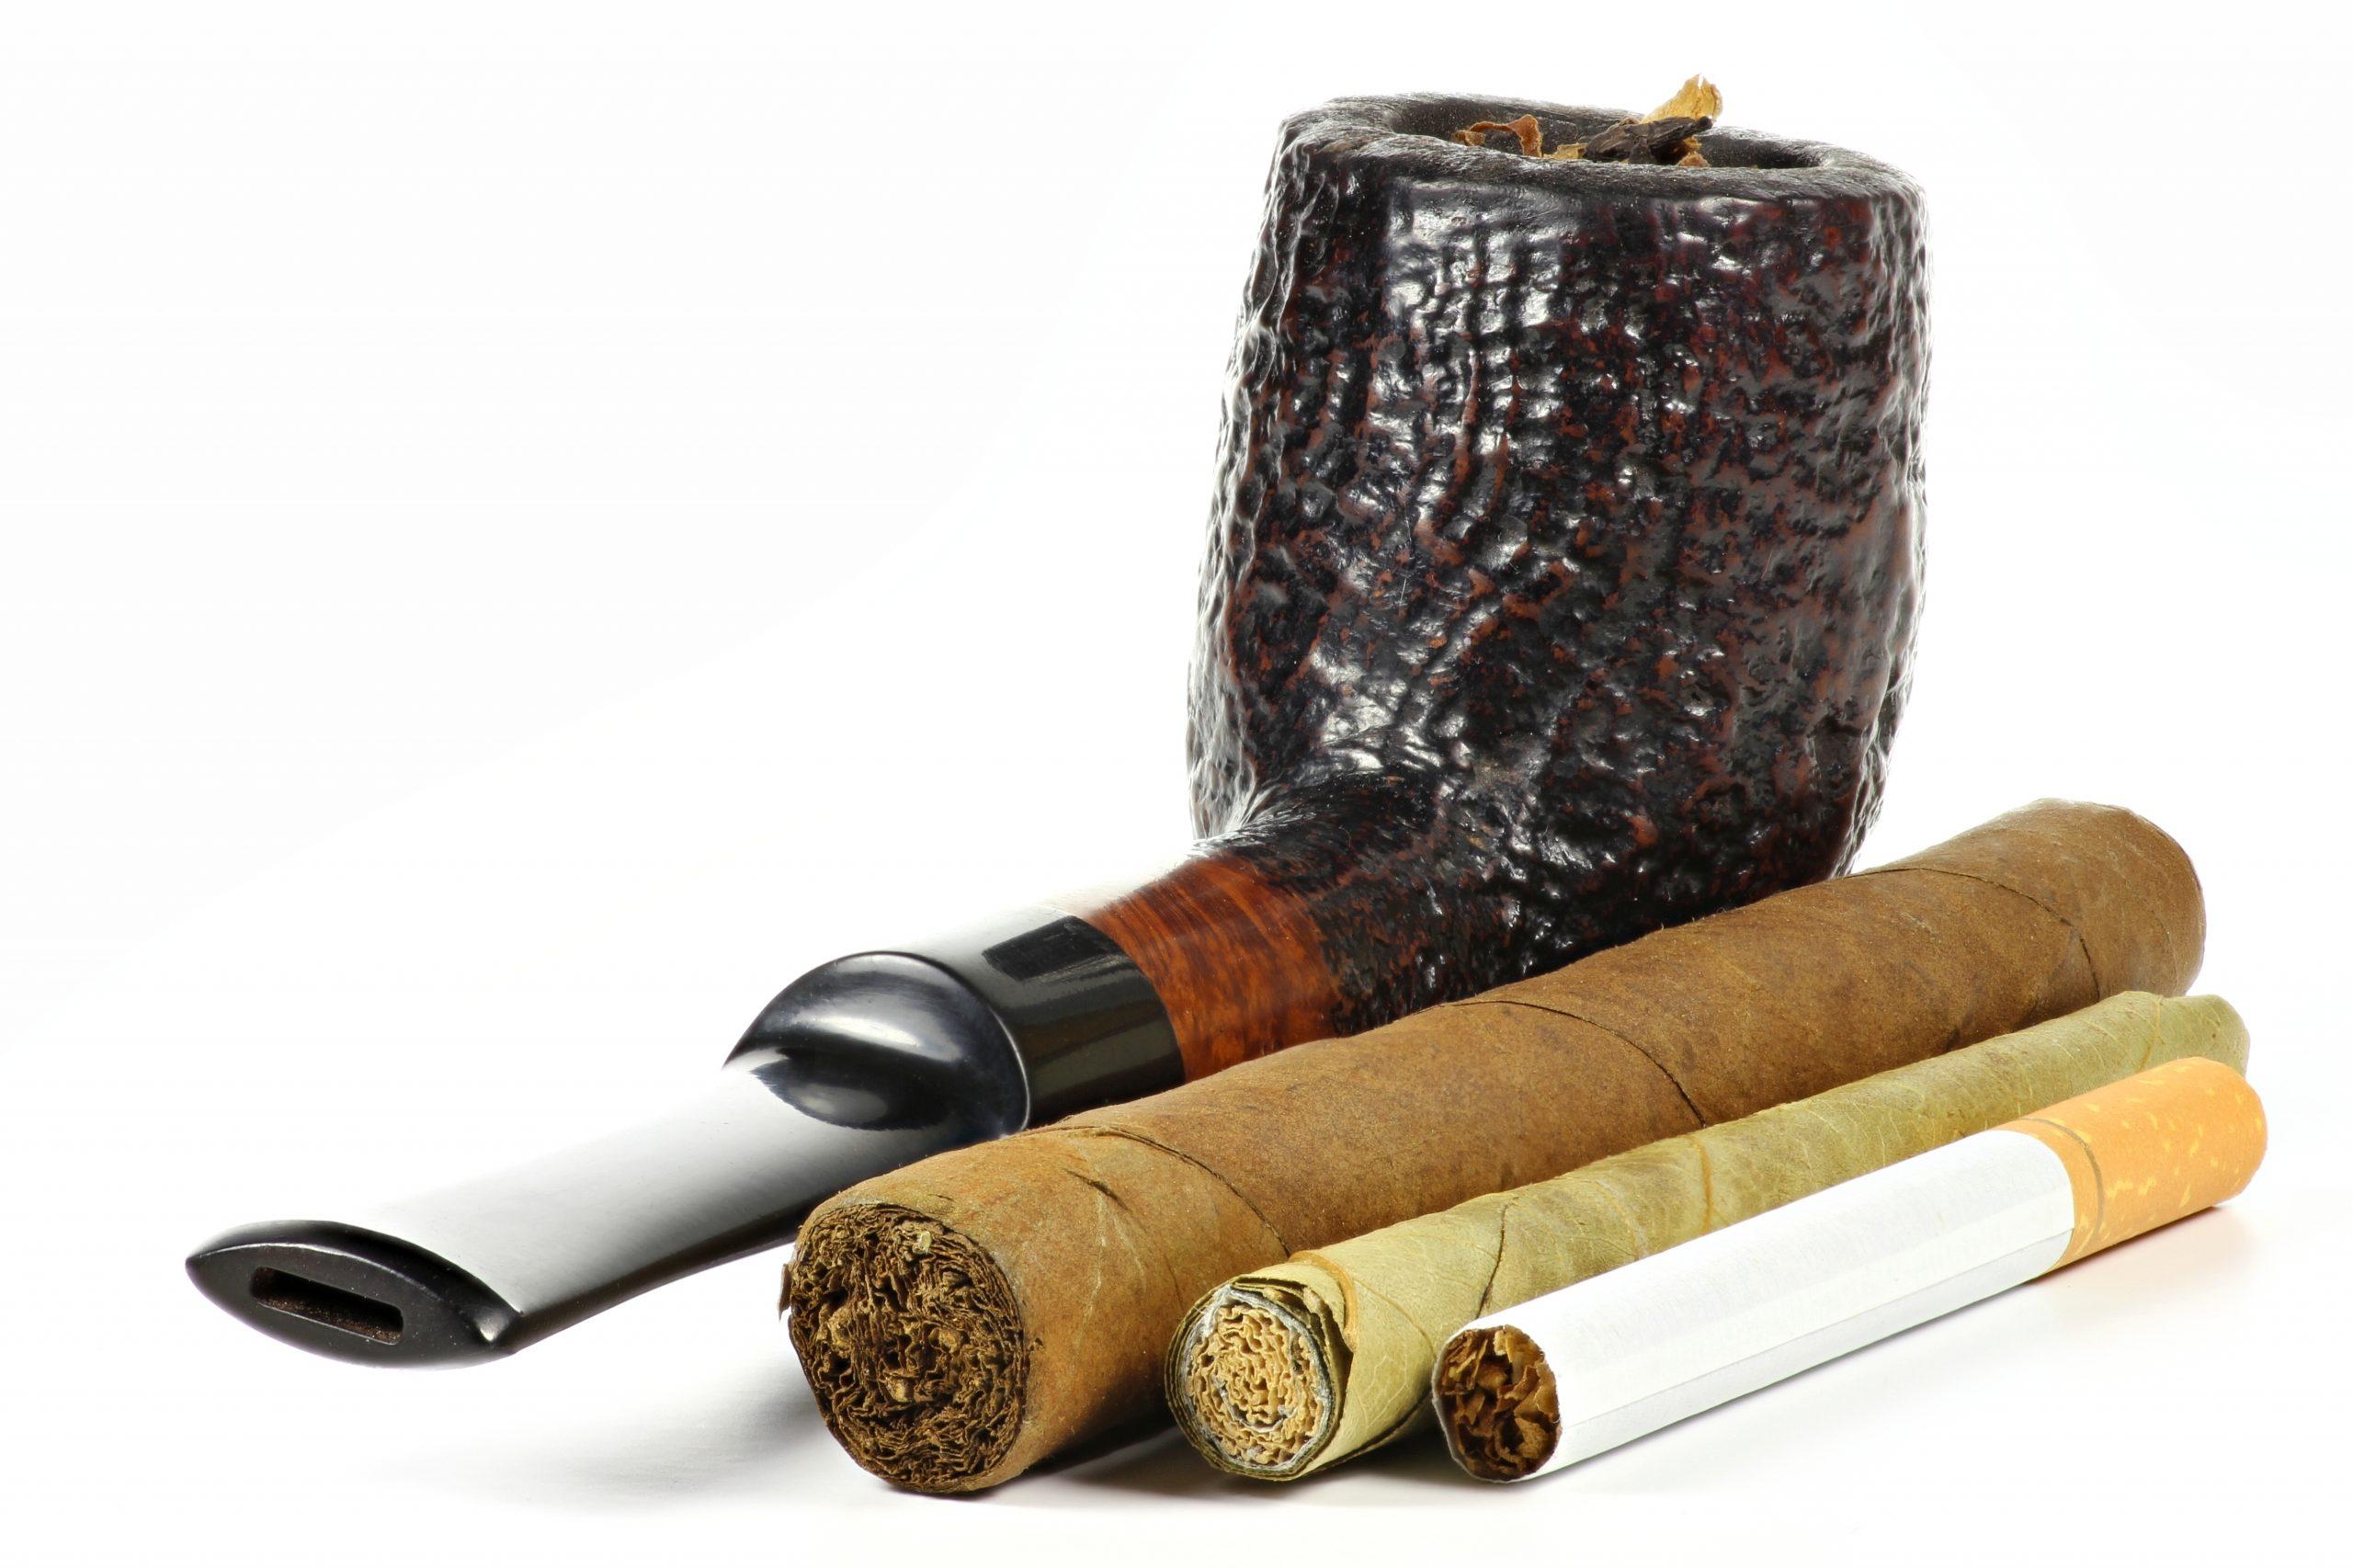 Cigarette Duty Increase Kicks In